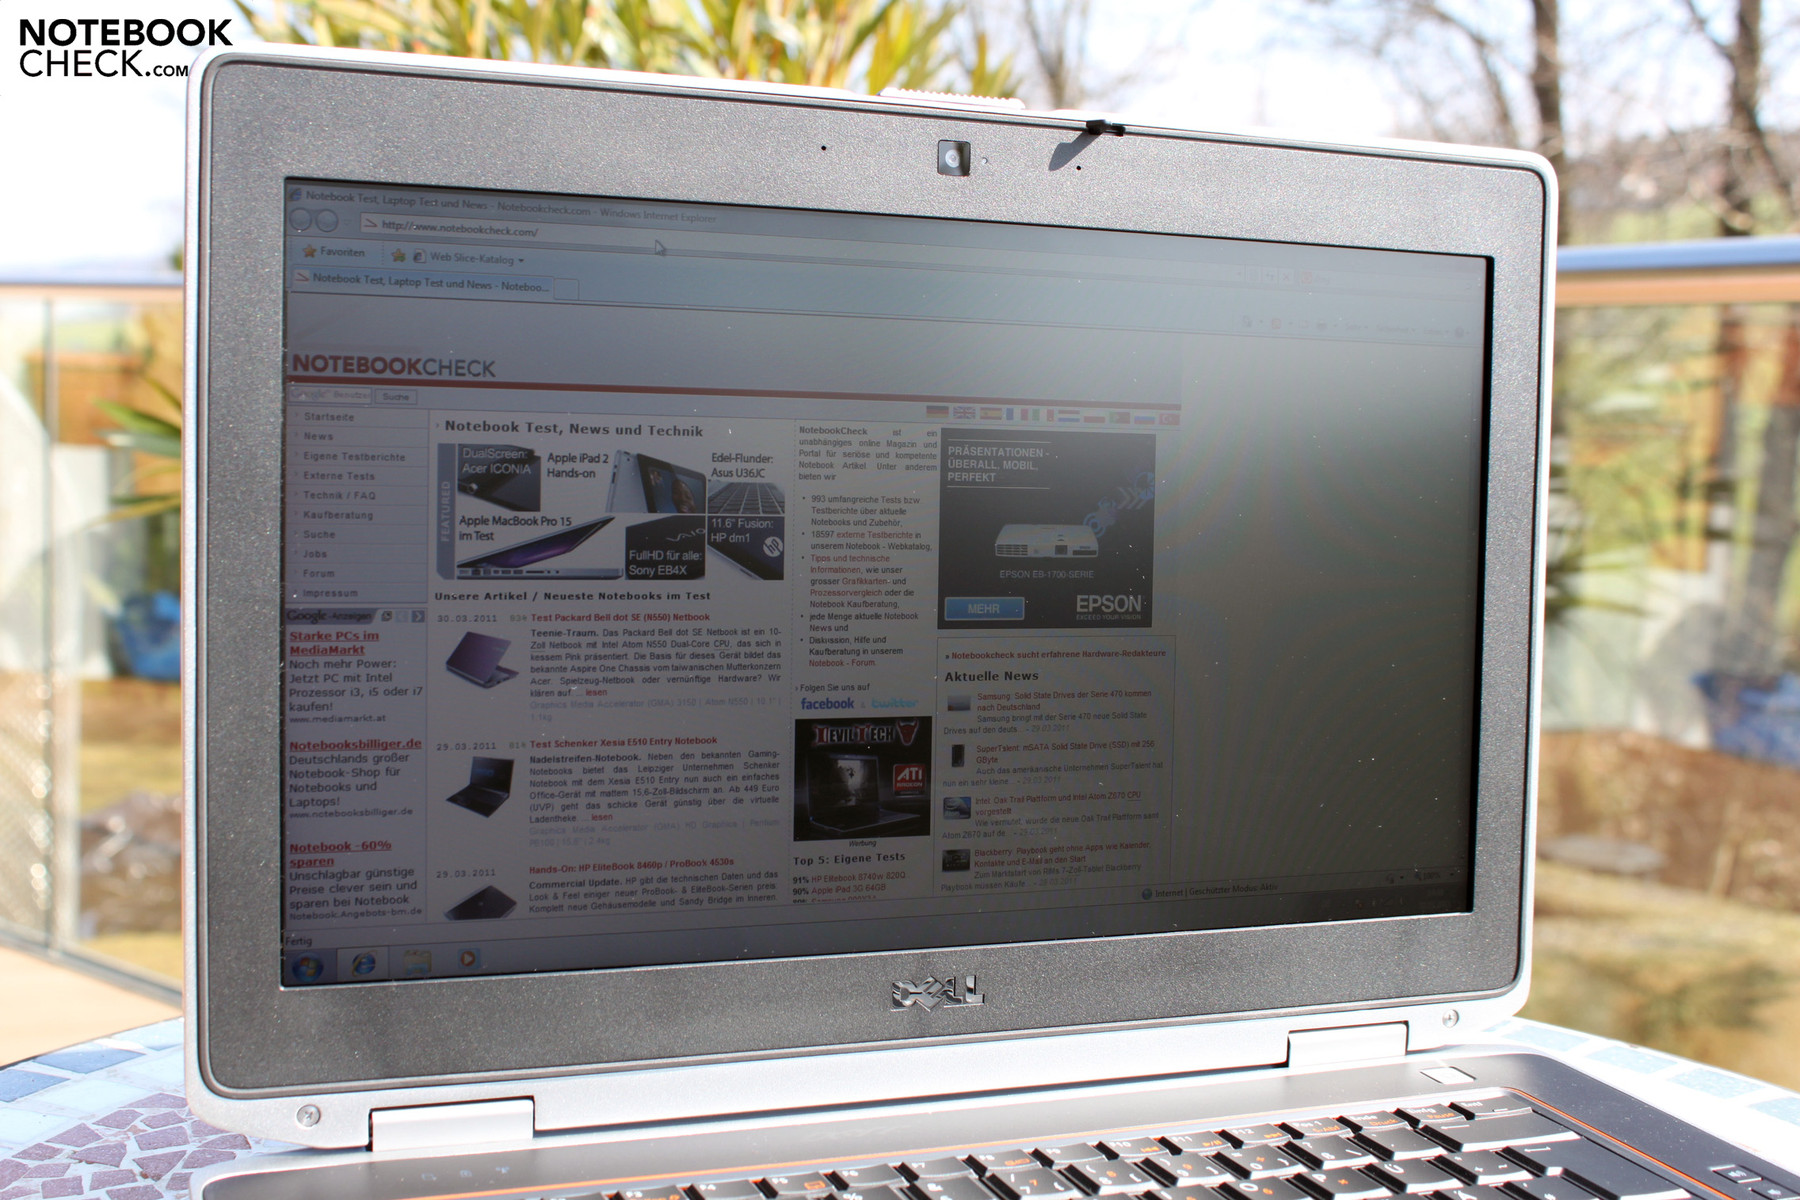 Buy Customize Dell E6420 I7 2nd Gen Used Laptop Online On Hilaptop Com